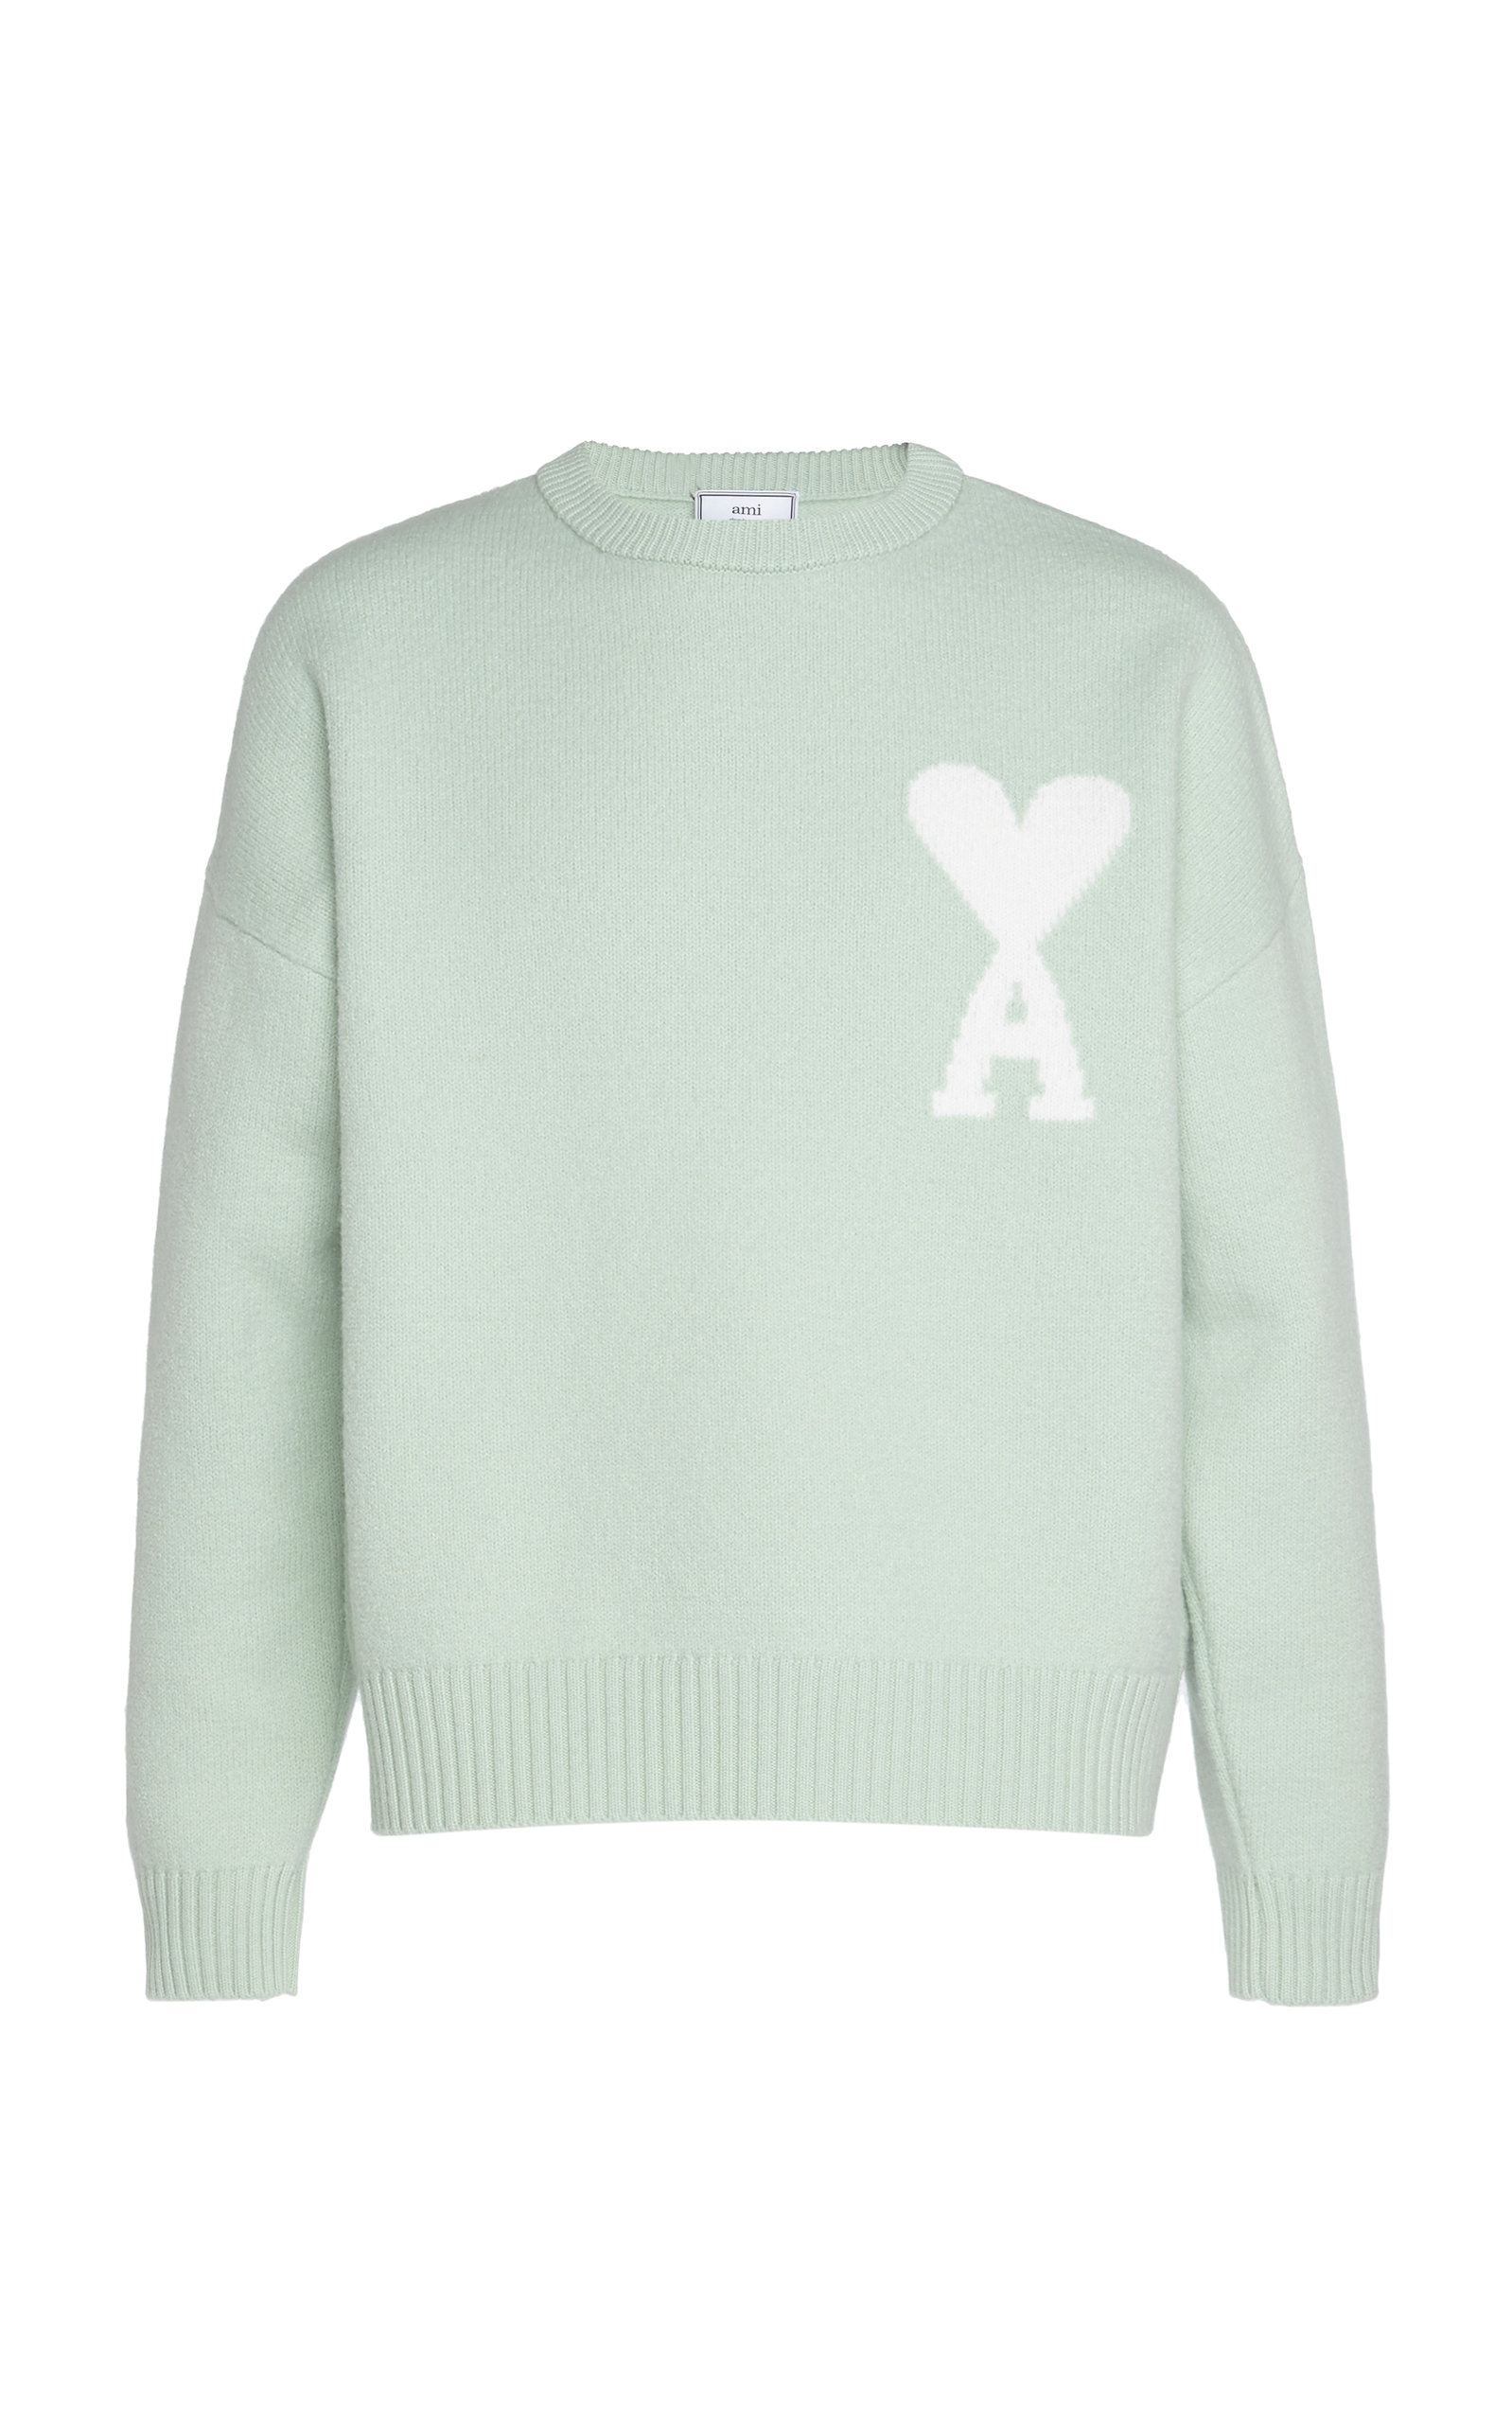 Ami Alexandre Mattiussi Sweaters Oversized Ami De Coeur Wool Sweater